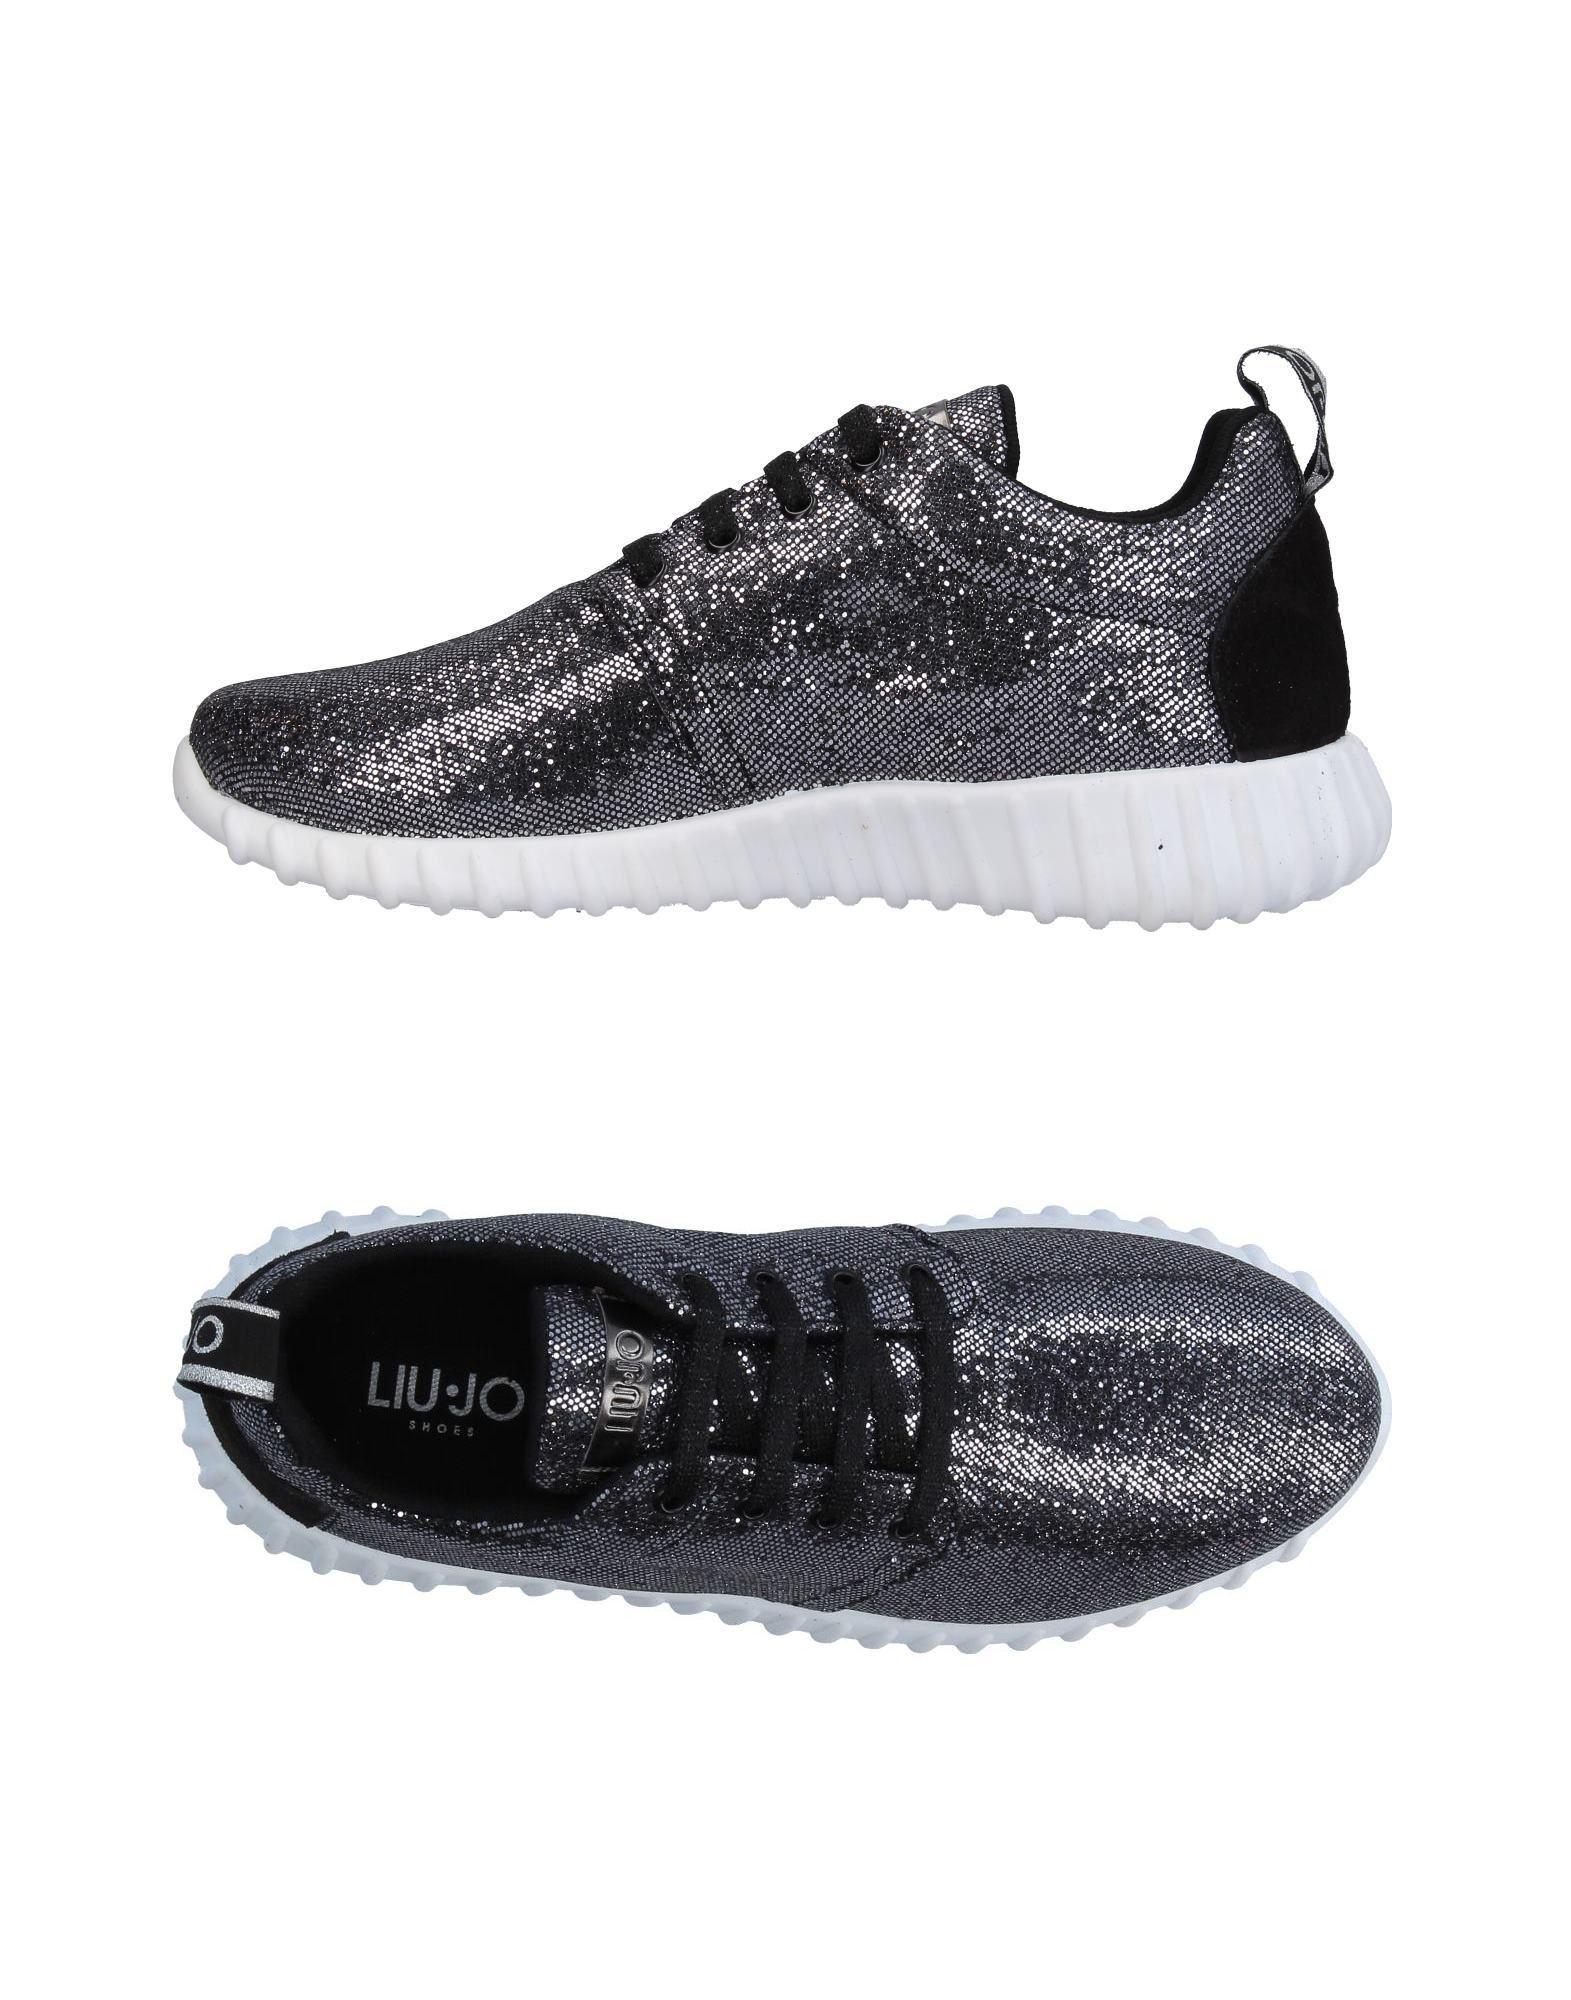 Liu •Jo Shoes Sneakers Qualität Damen  11365598BR Gute Qualität Sneakers beliebte Schuhe 18ae26